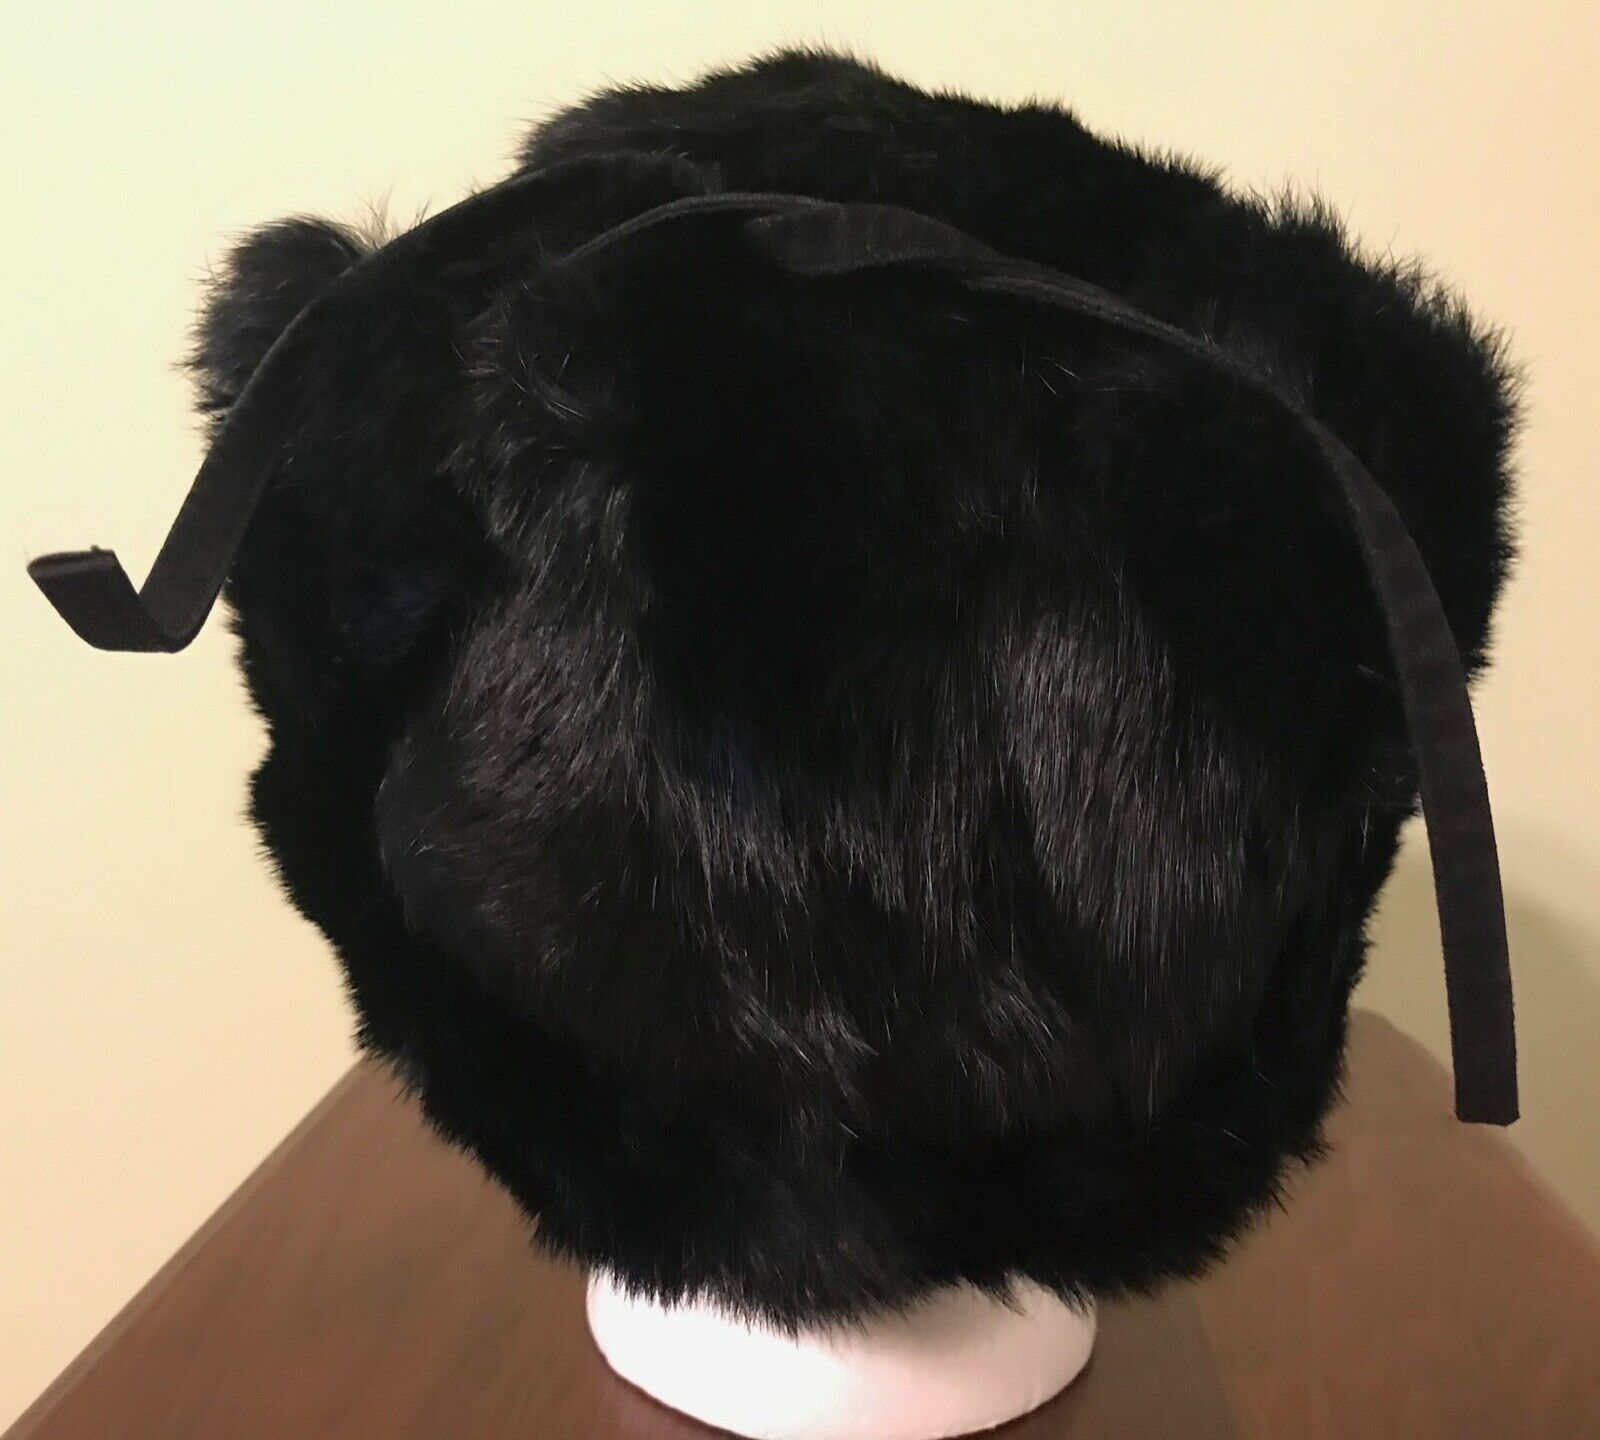 Vintage Black Mink Ladies' Hat with Flap Ear Muffs - image 4